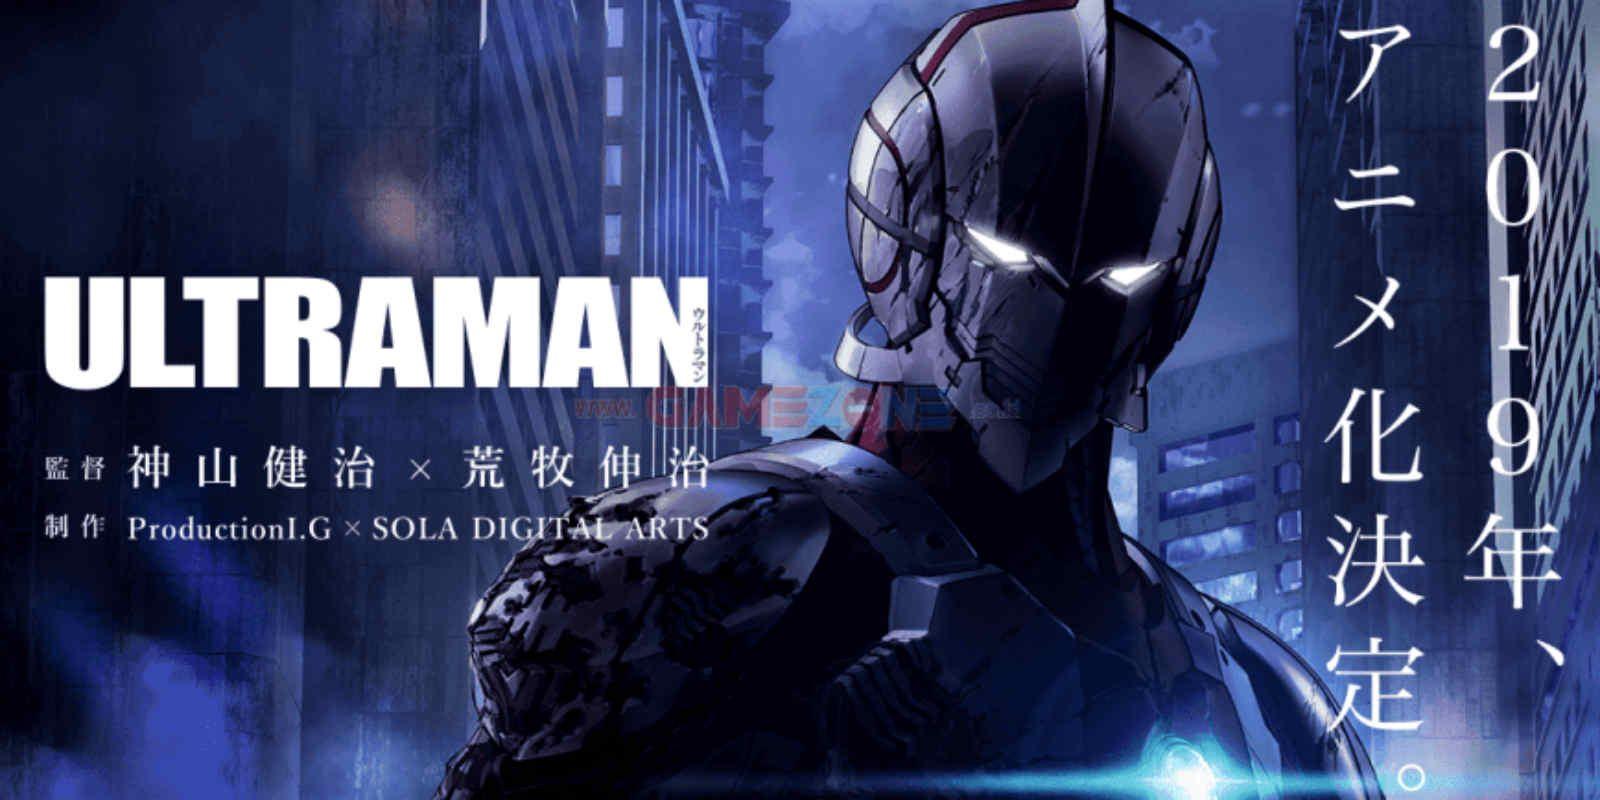 Ultraman episode 01 13 subtitle indonesia